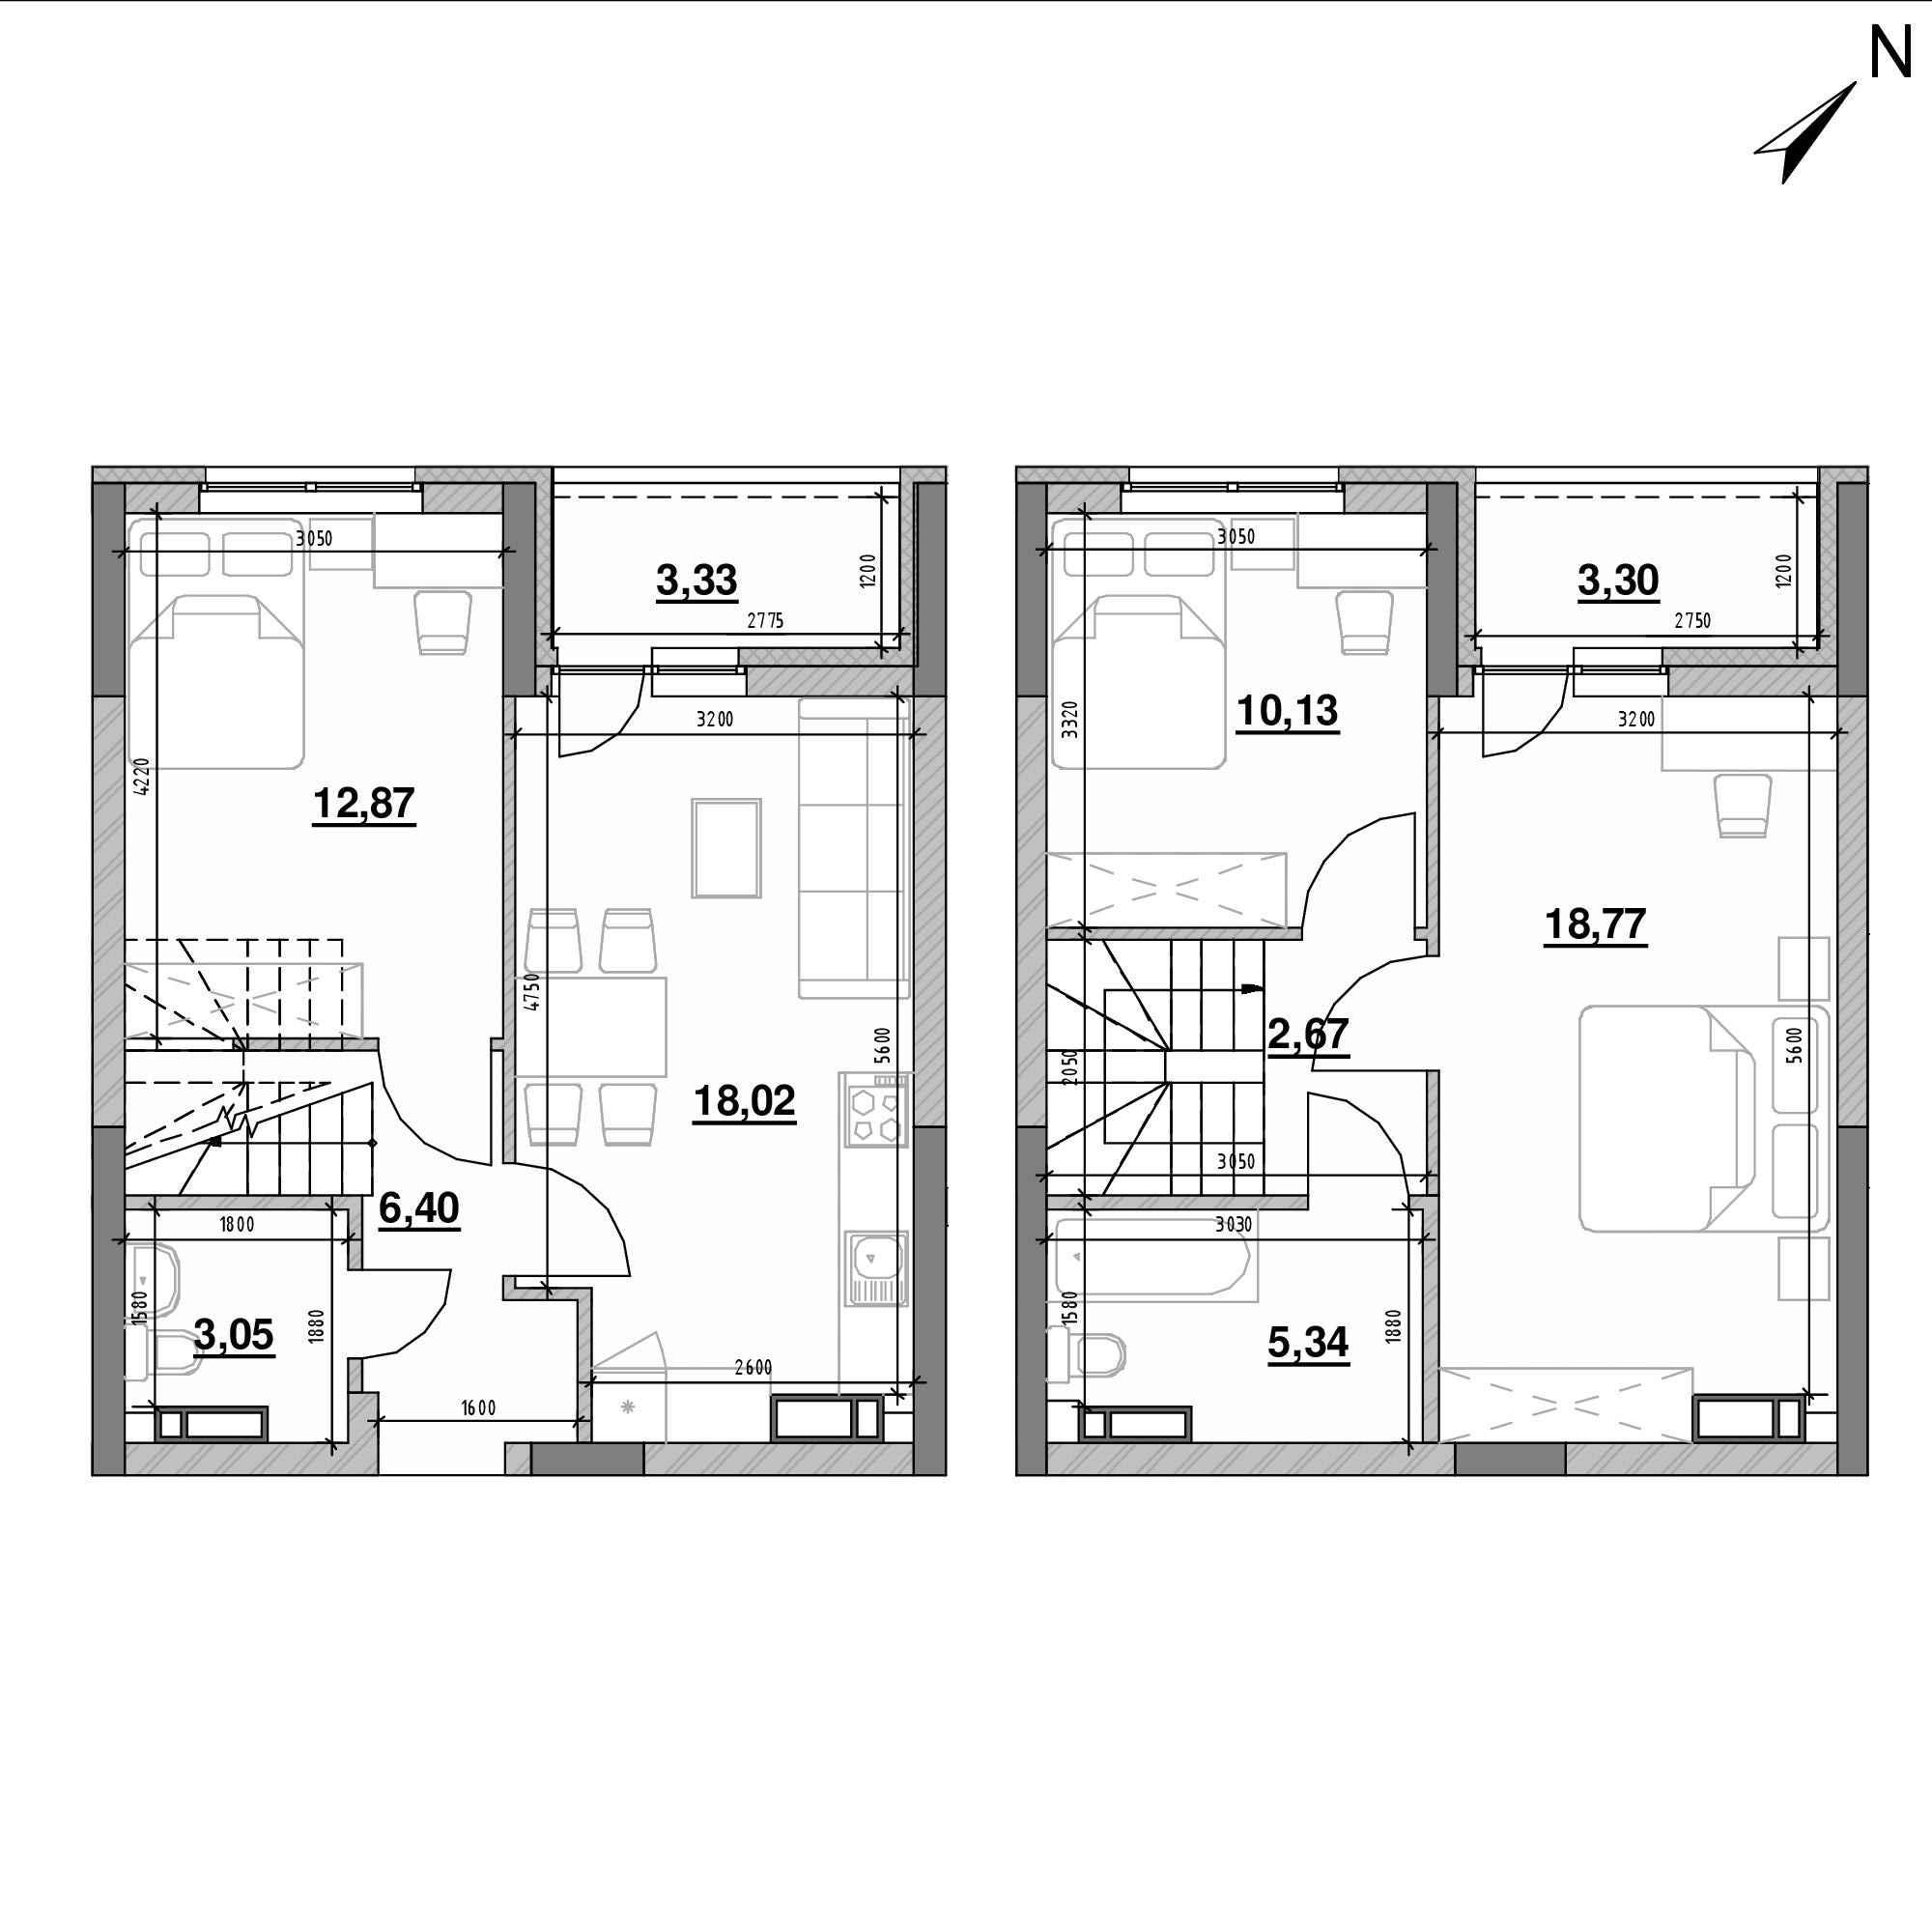 ЖК Оk'Land: планування 3-кімнатної квартири, №459, 83.88 м<sup>2</sup>